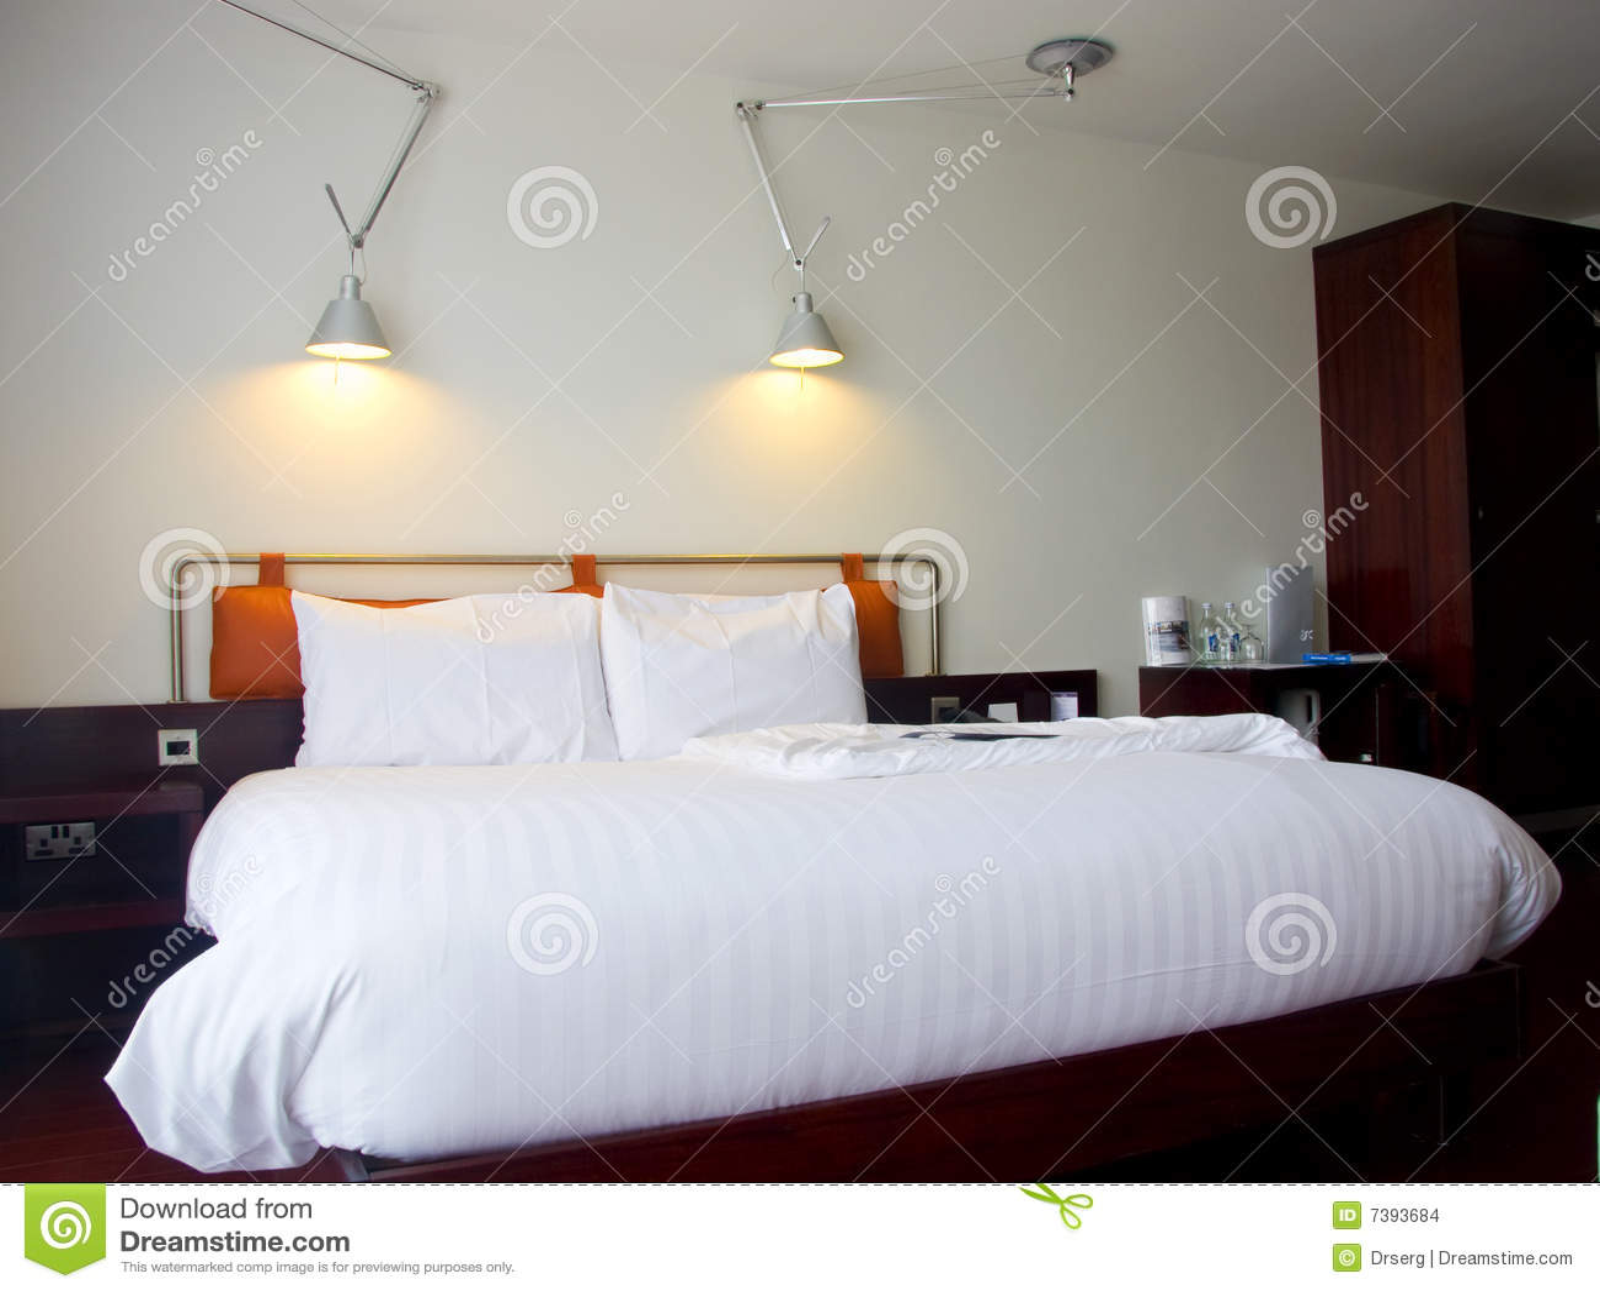 modernes king size bett mit lampen stockbilder bild 7393684. Black Bedroom Furniture Sets. Home Design Ideas